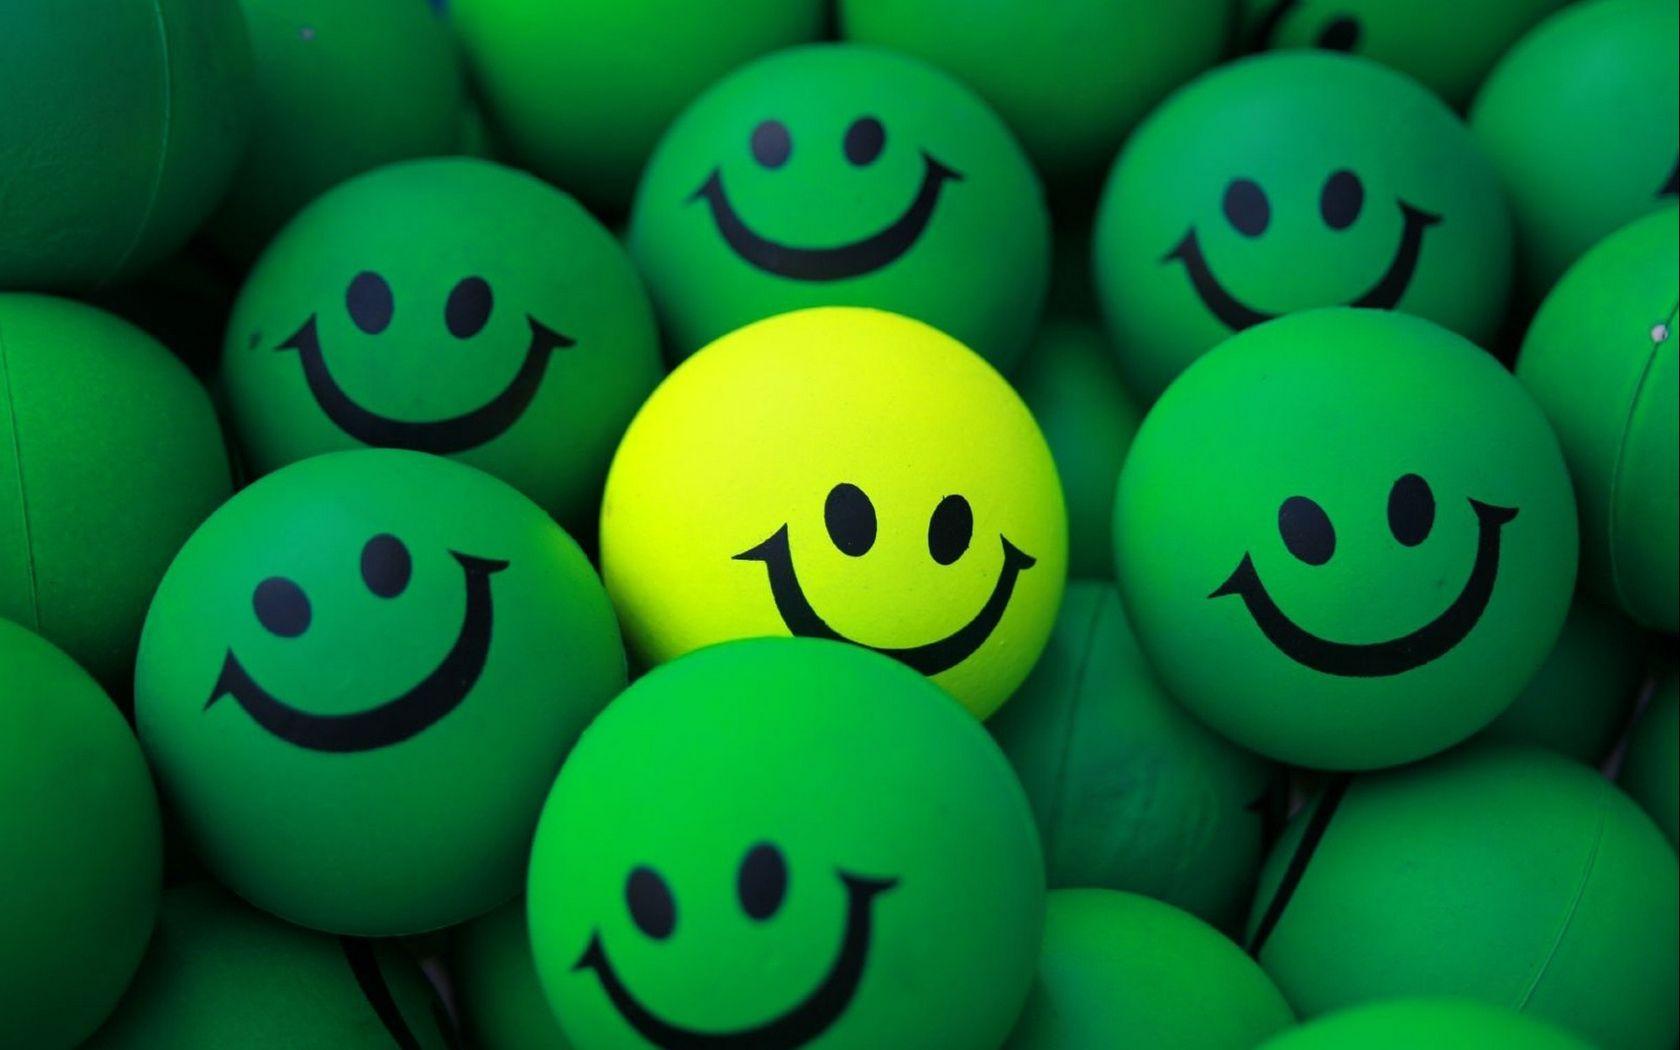 1680x1050 Wallpaper balls, smile, green, yellow